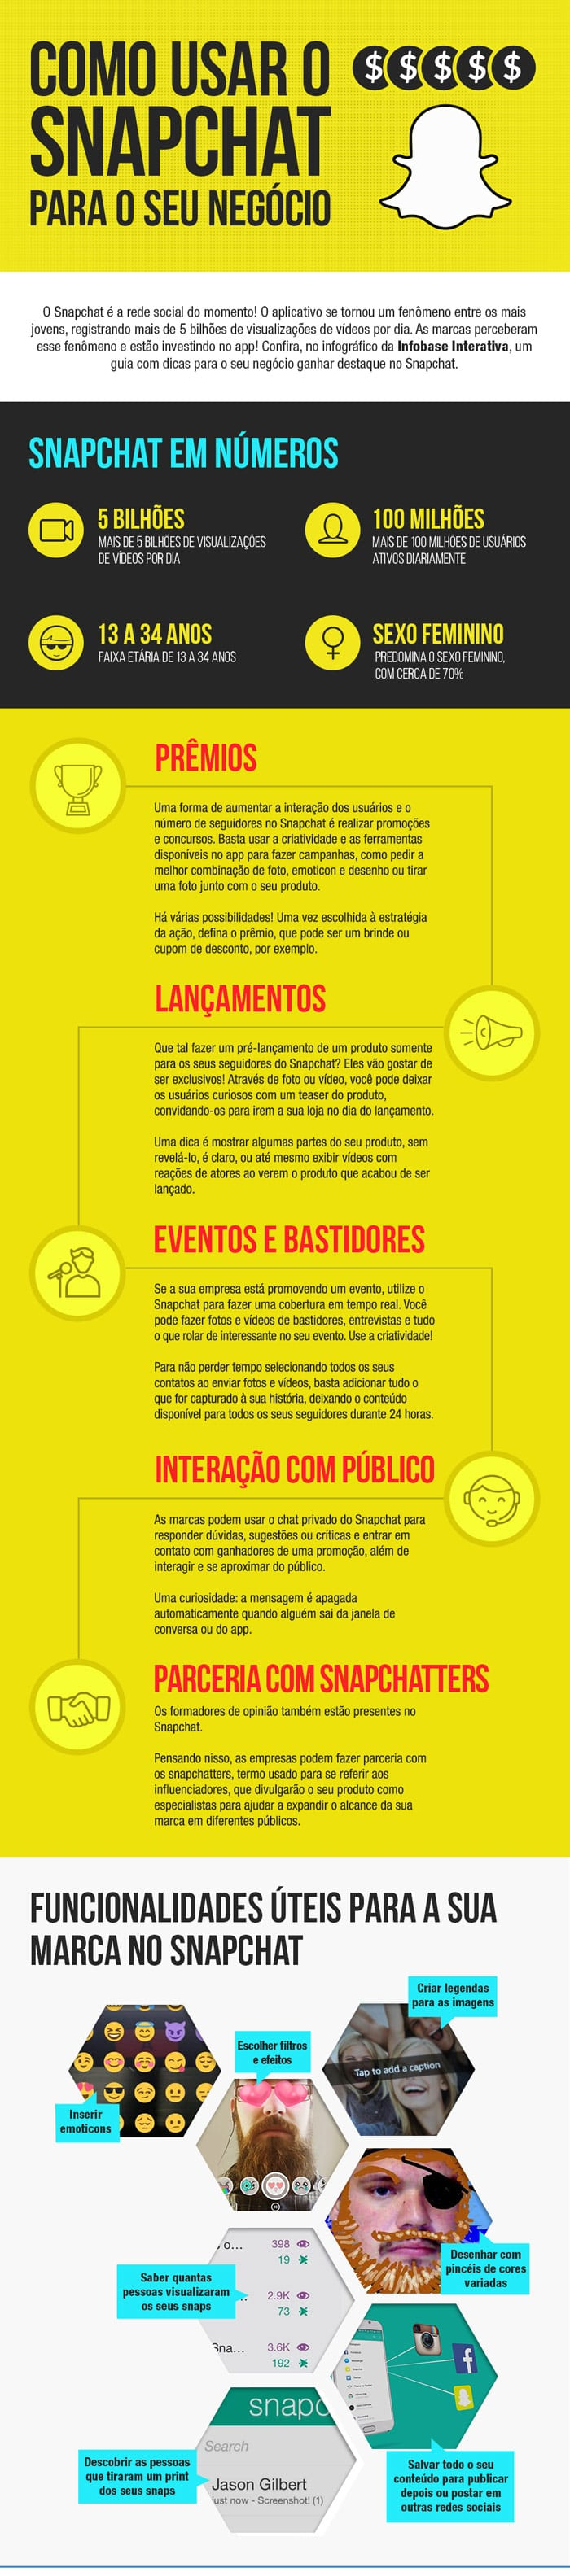 infografico-snapchat-negocios